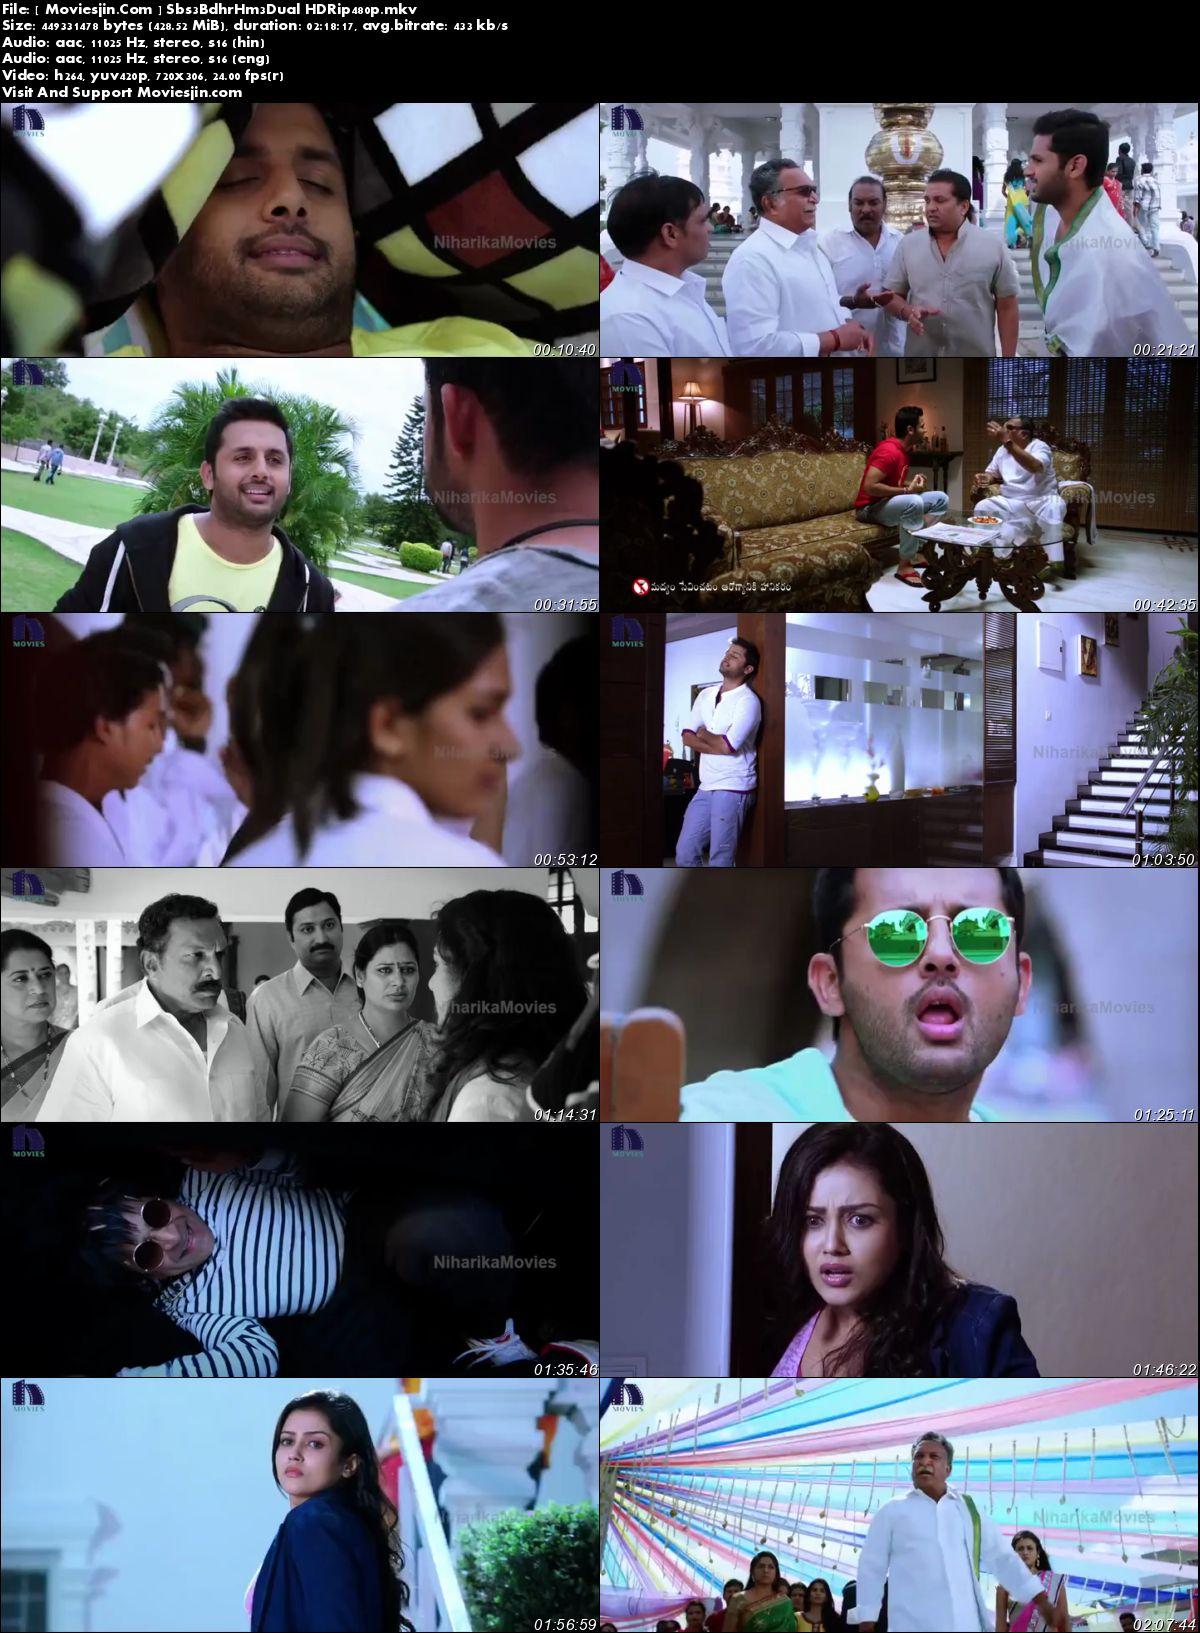 Watch Online Sabse Badhkar Hum 3 2018 HDRip Hindi 1GB Dual Audio ORG 720p Full Movie Download mkvcage